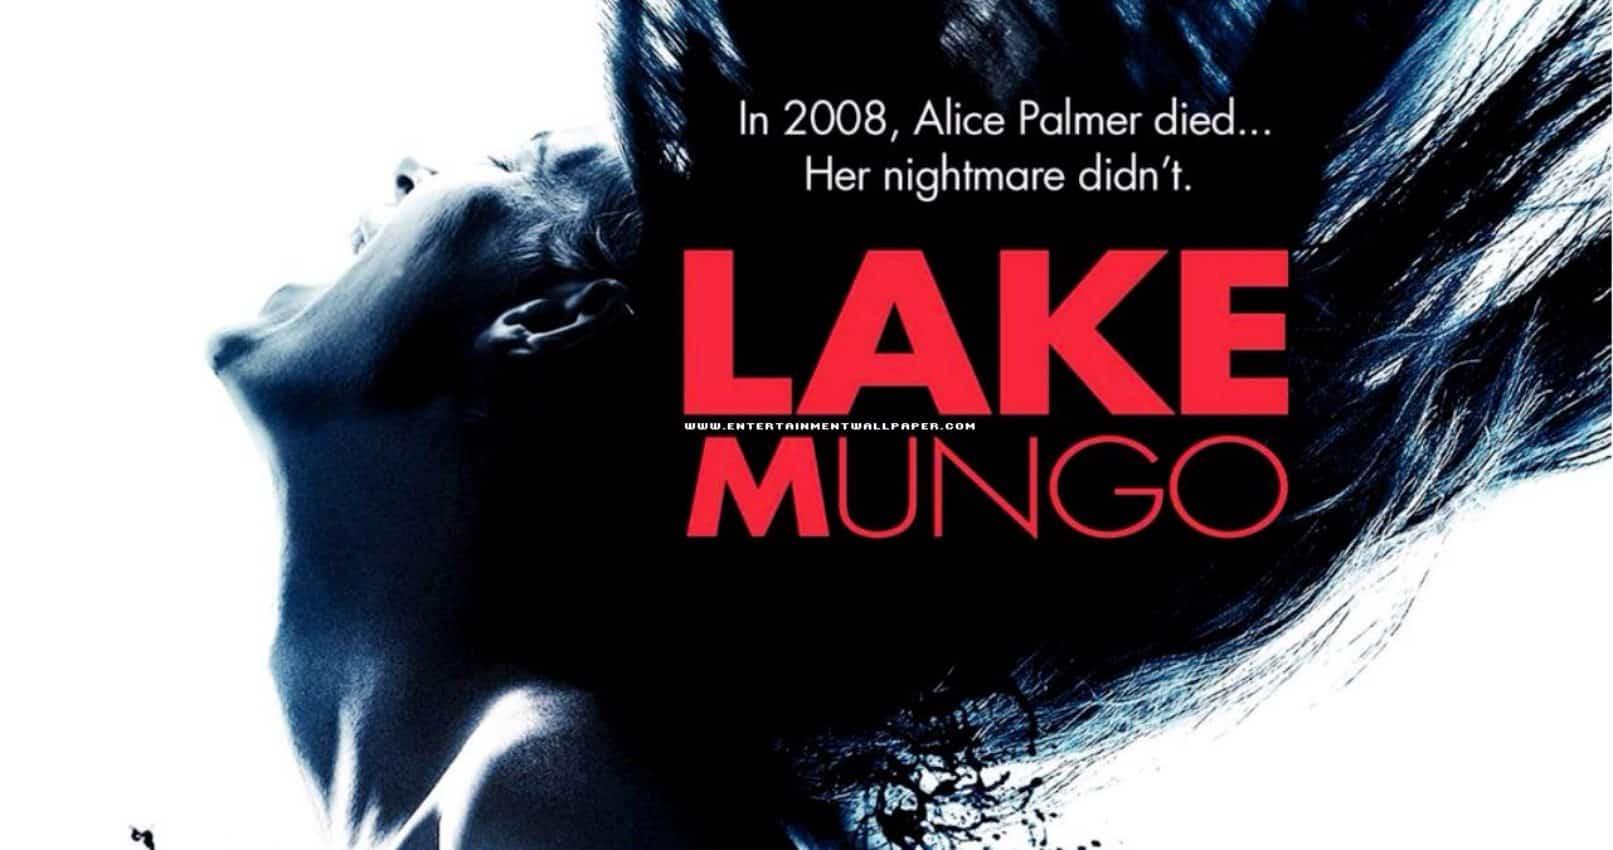 Horror Movie Review: Lake Mungo (2008)